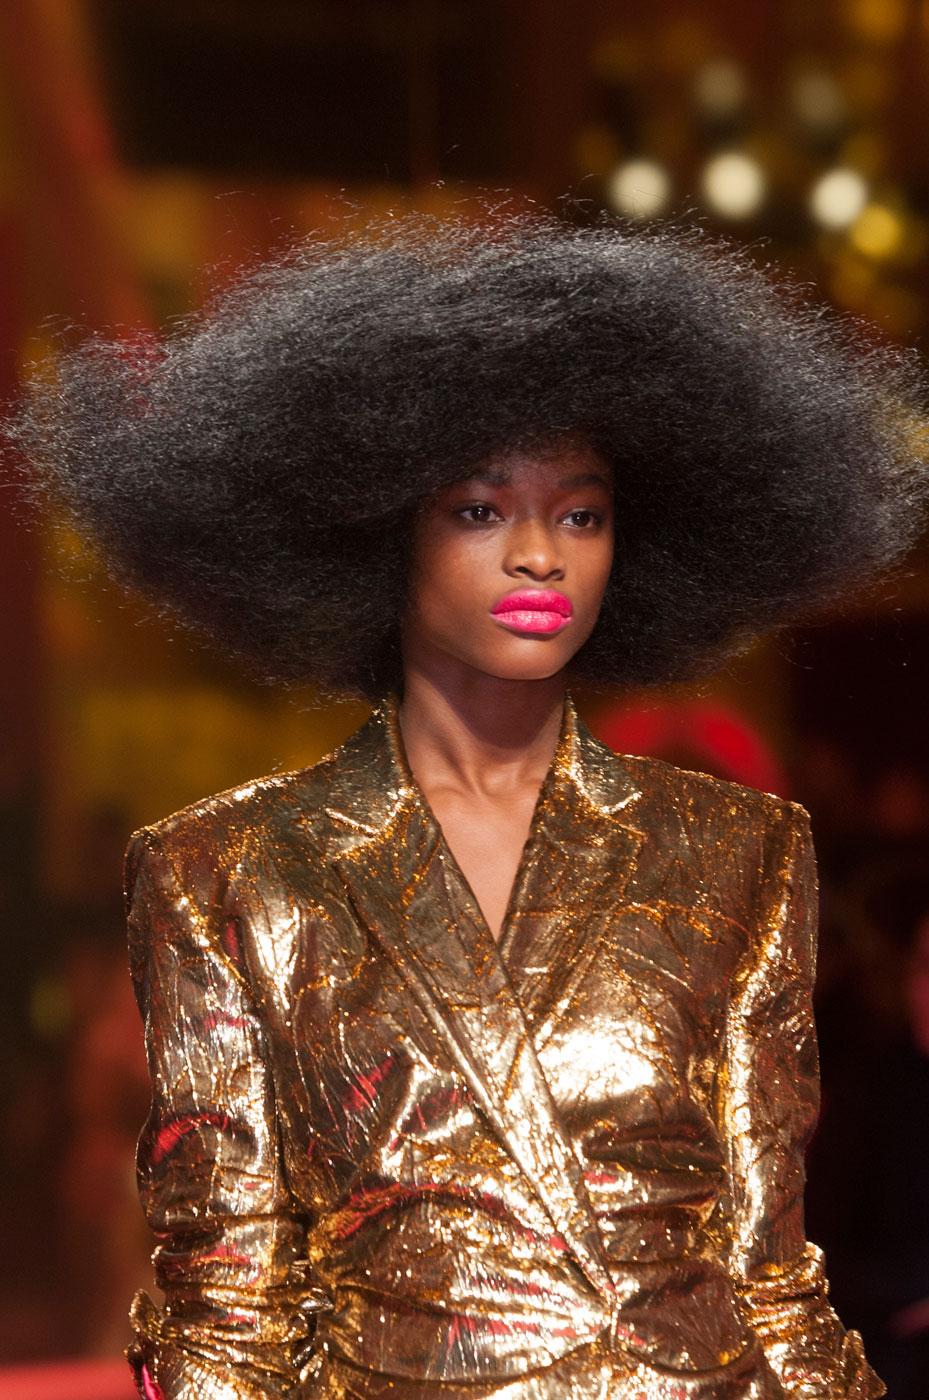 Schiaparelli-fashion-runway-show-close-ups-haute-couture-paris-spring-summer-2015-the-impression-38